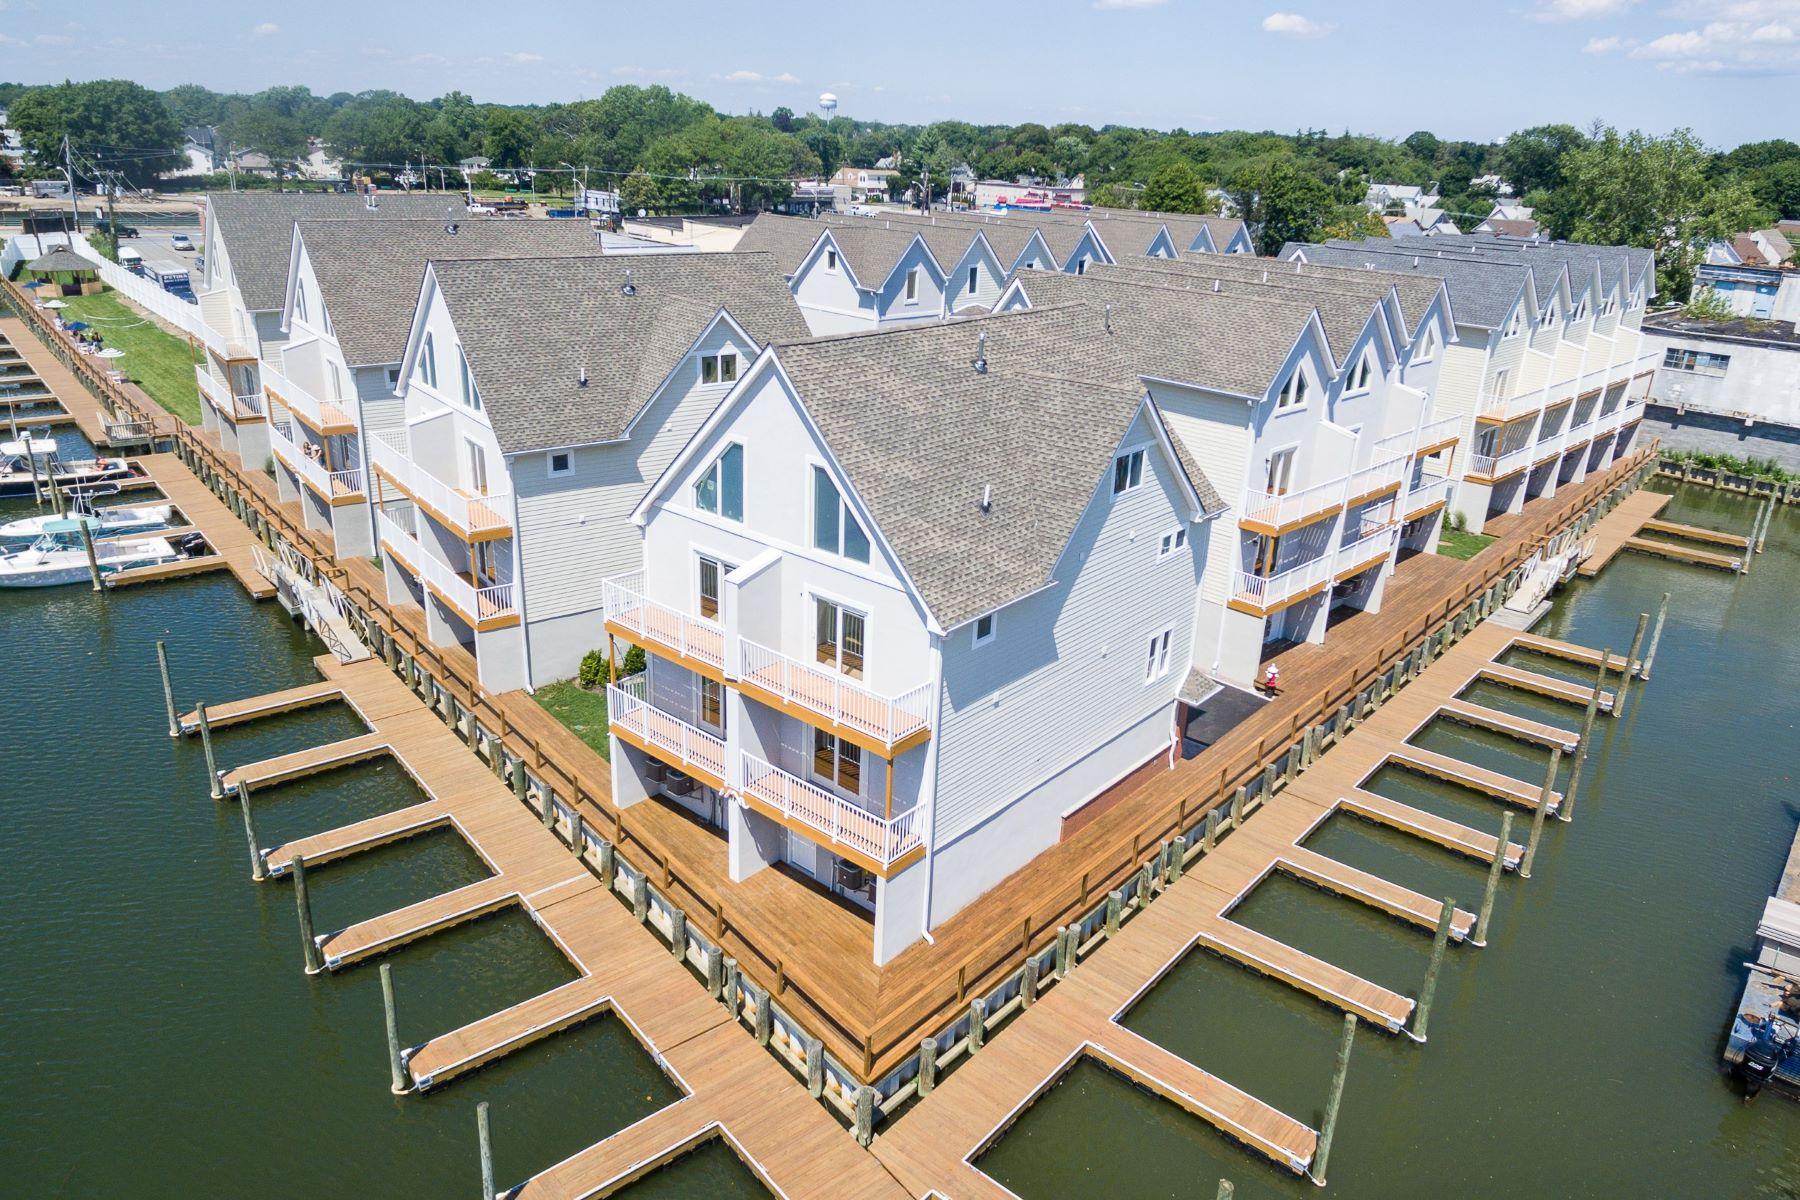 Condominium for Sale at Condo 600 Ray St 21 Freeport, New York 11520 United States